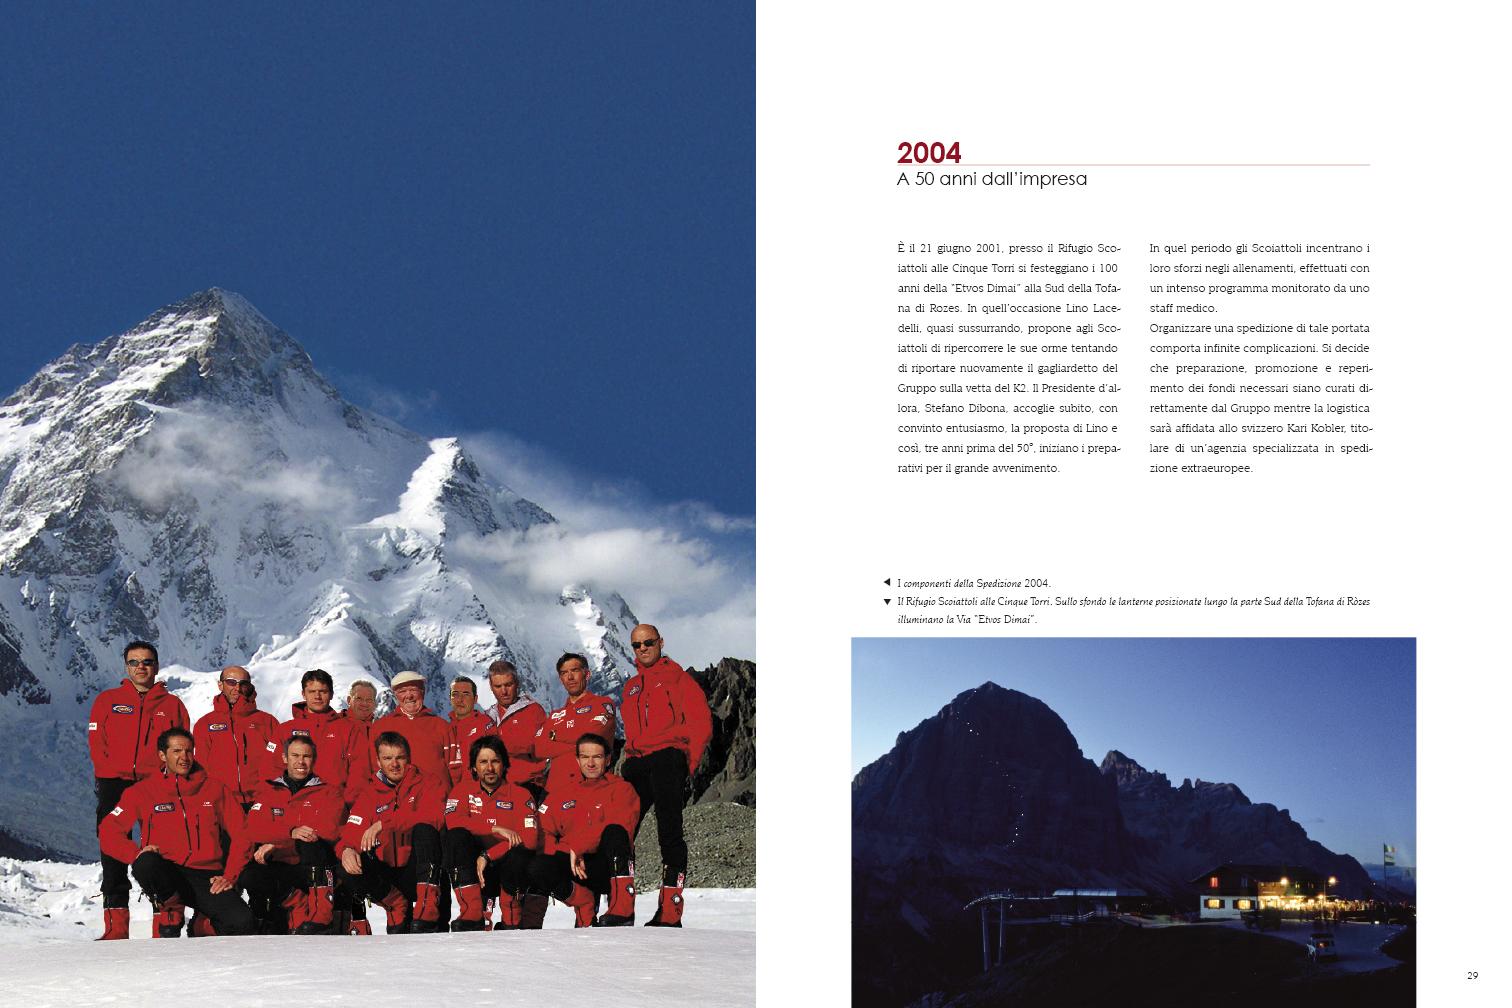 K2 EXPEDITION 1954-2004 Giuseppe Ghedina Fotografo - 016.jpg